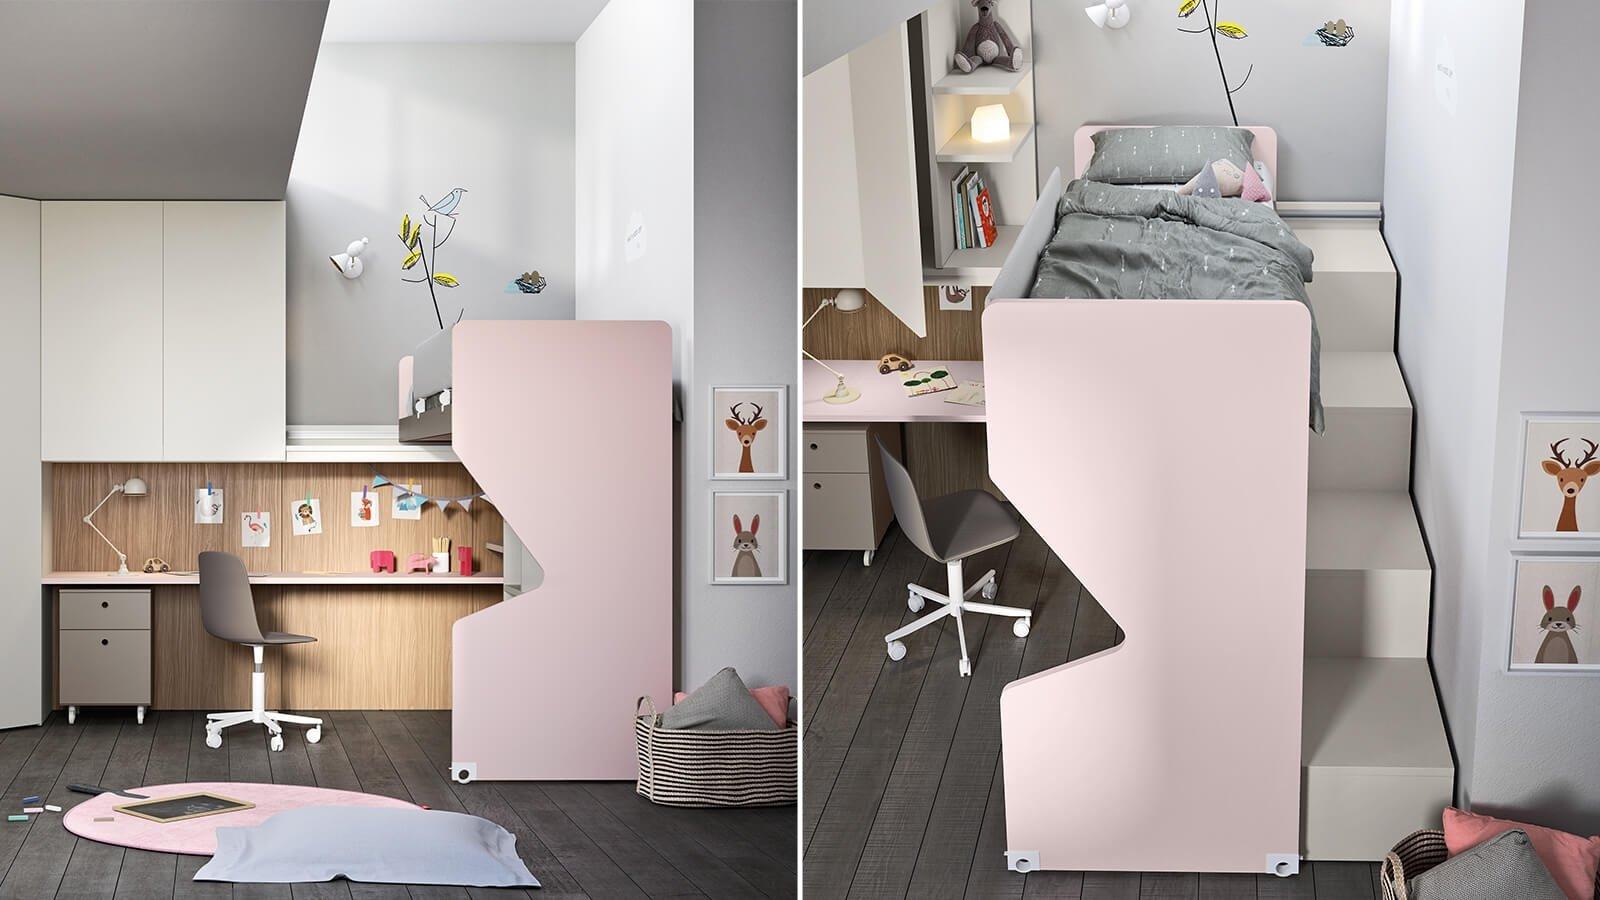 Slide sliding loft bed